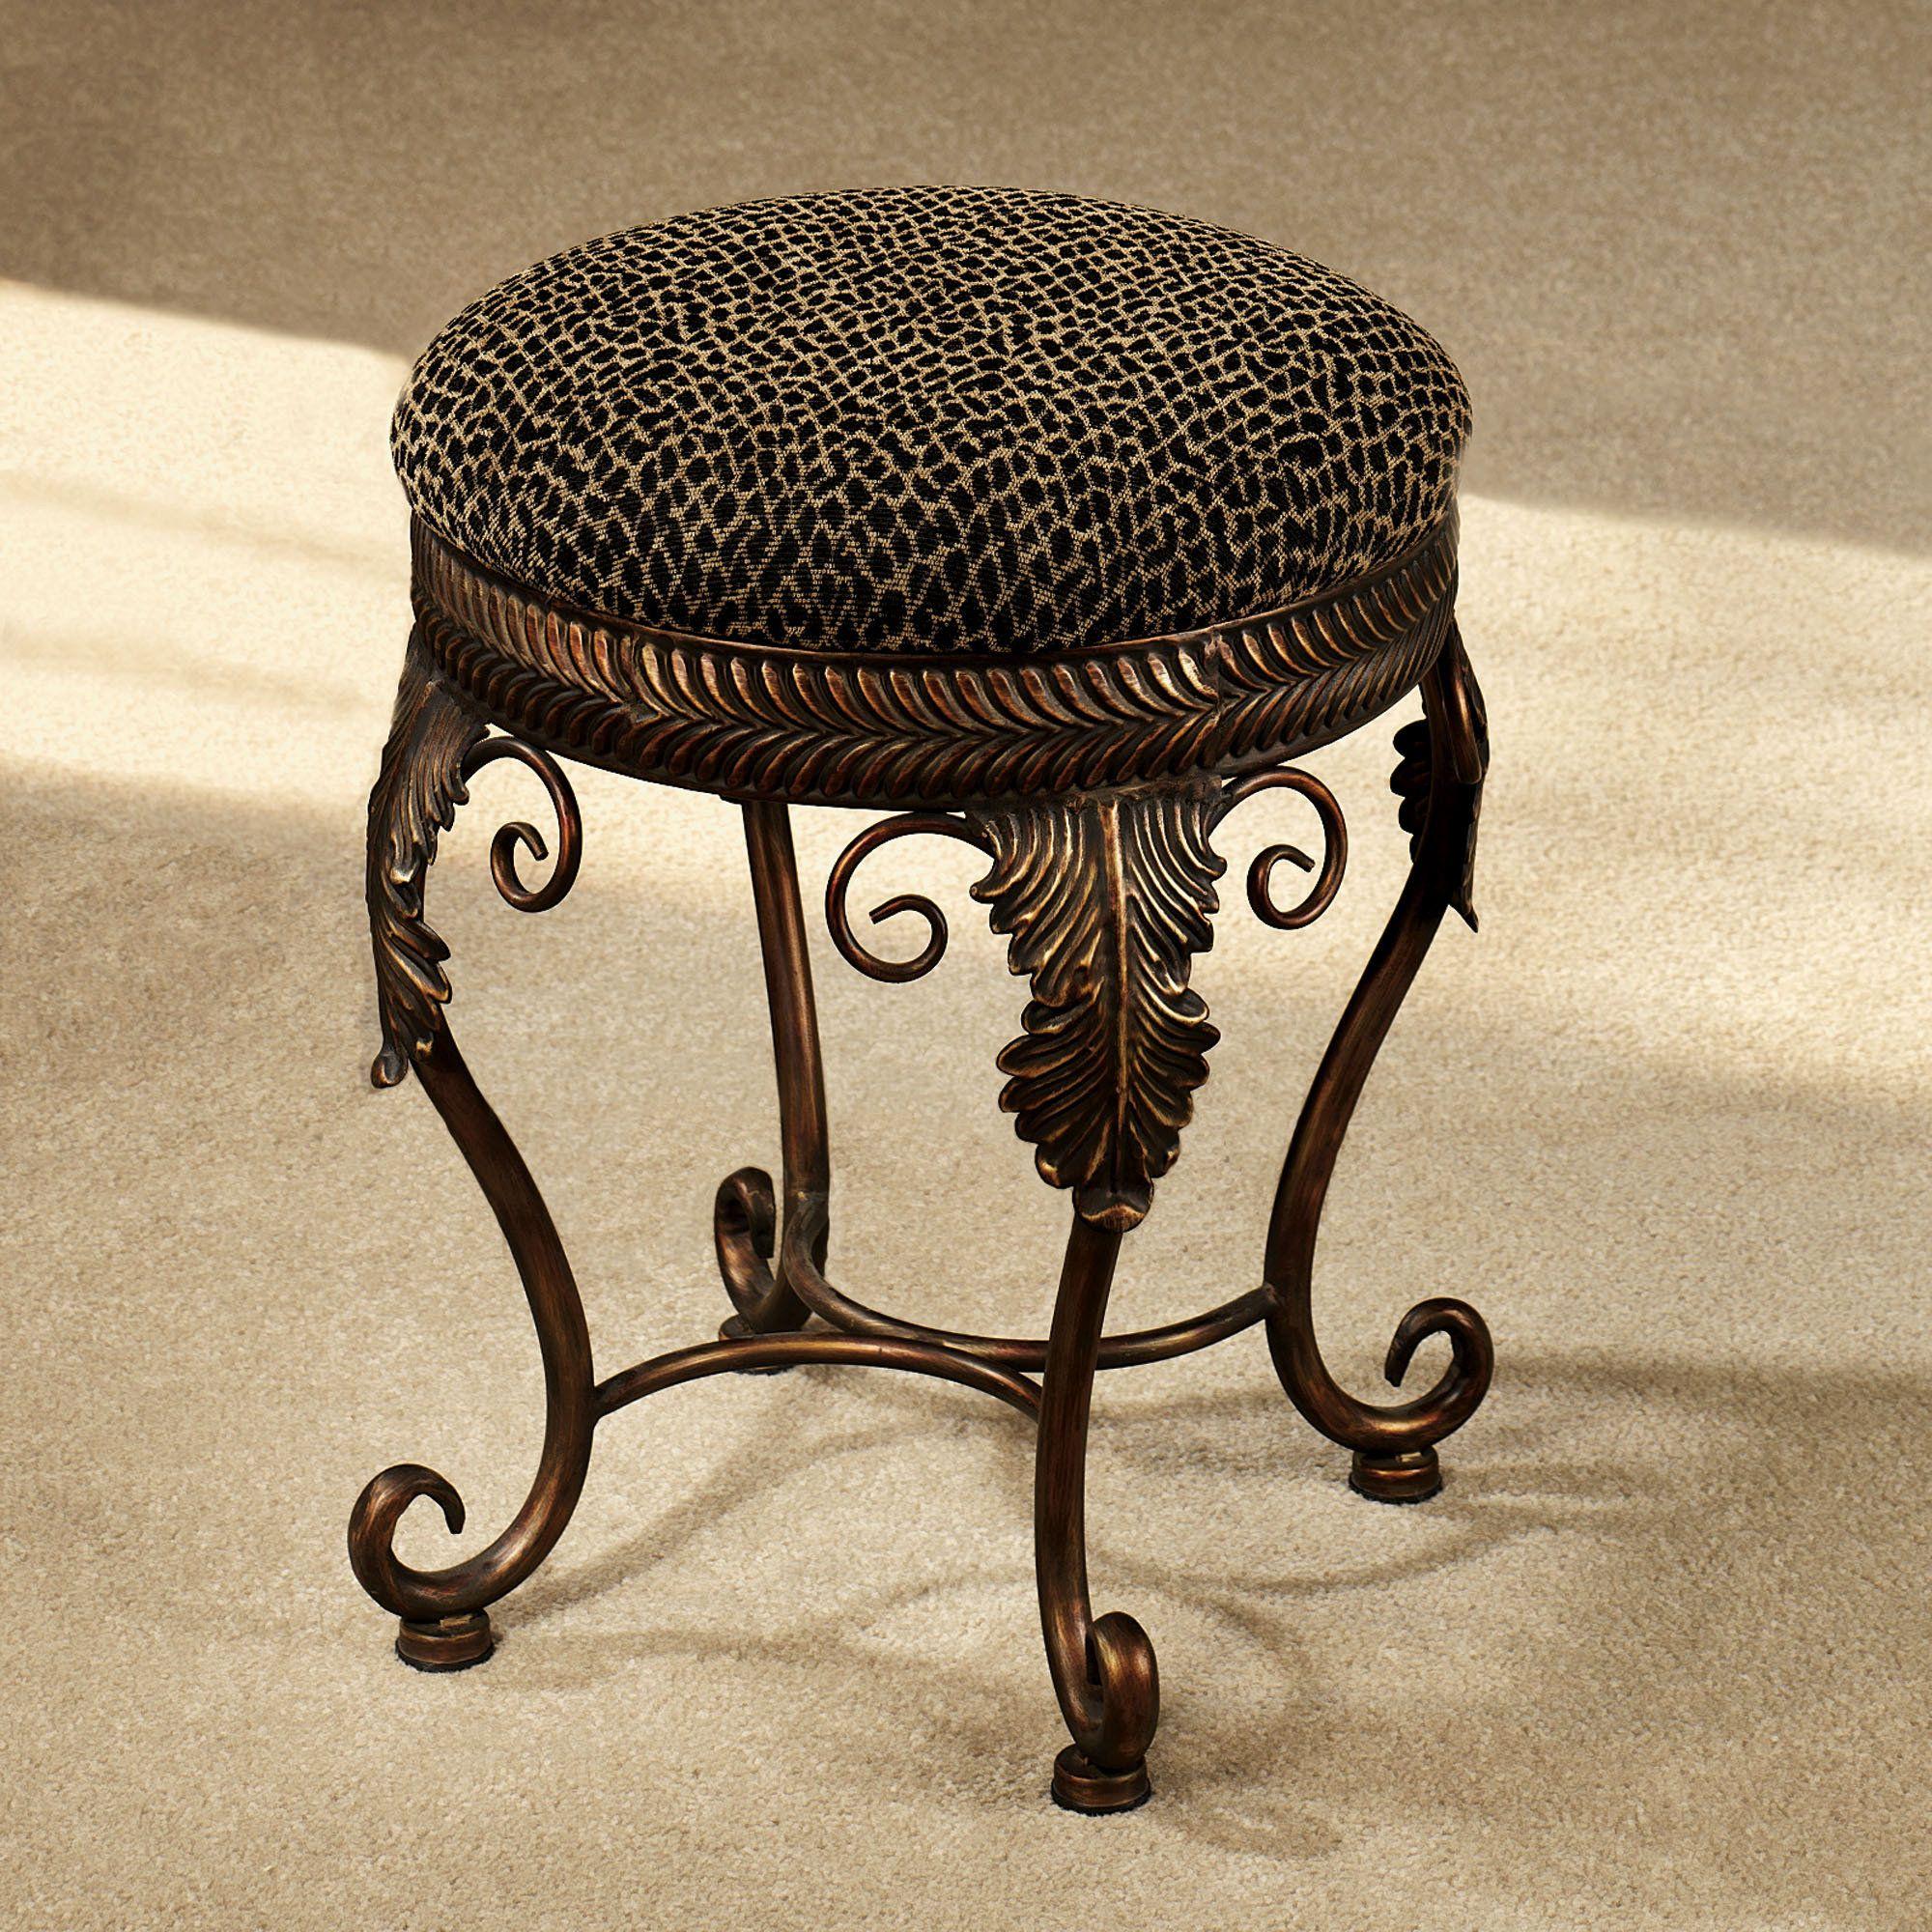 Strange Elegant African Upholstered Bathroom Vanity Chairs Pattern Beatyapartments Chair Design Images Beatyapartmentscom